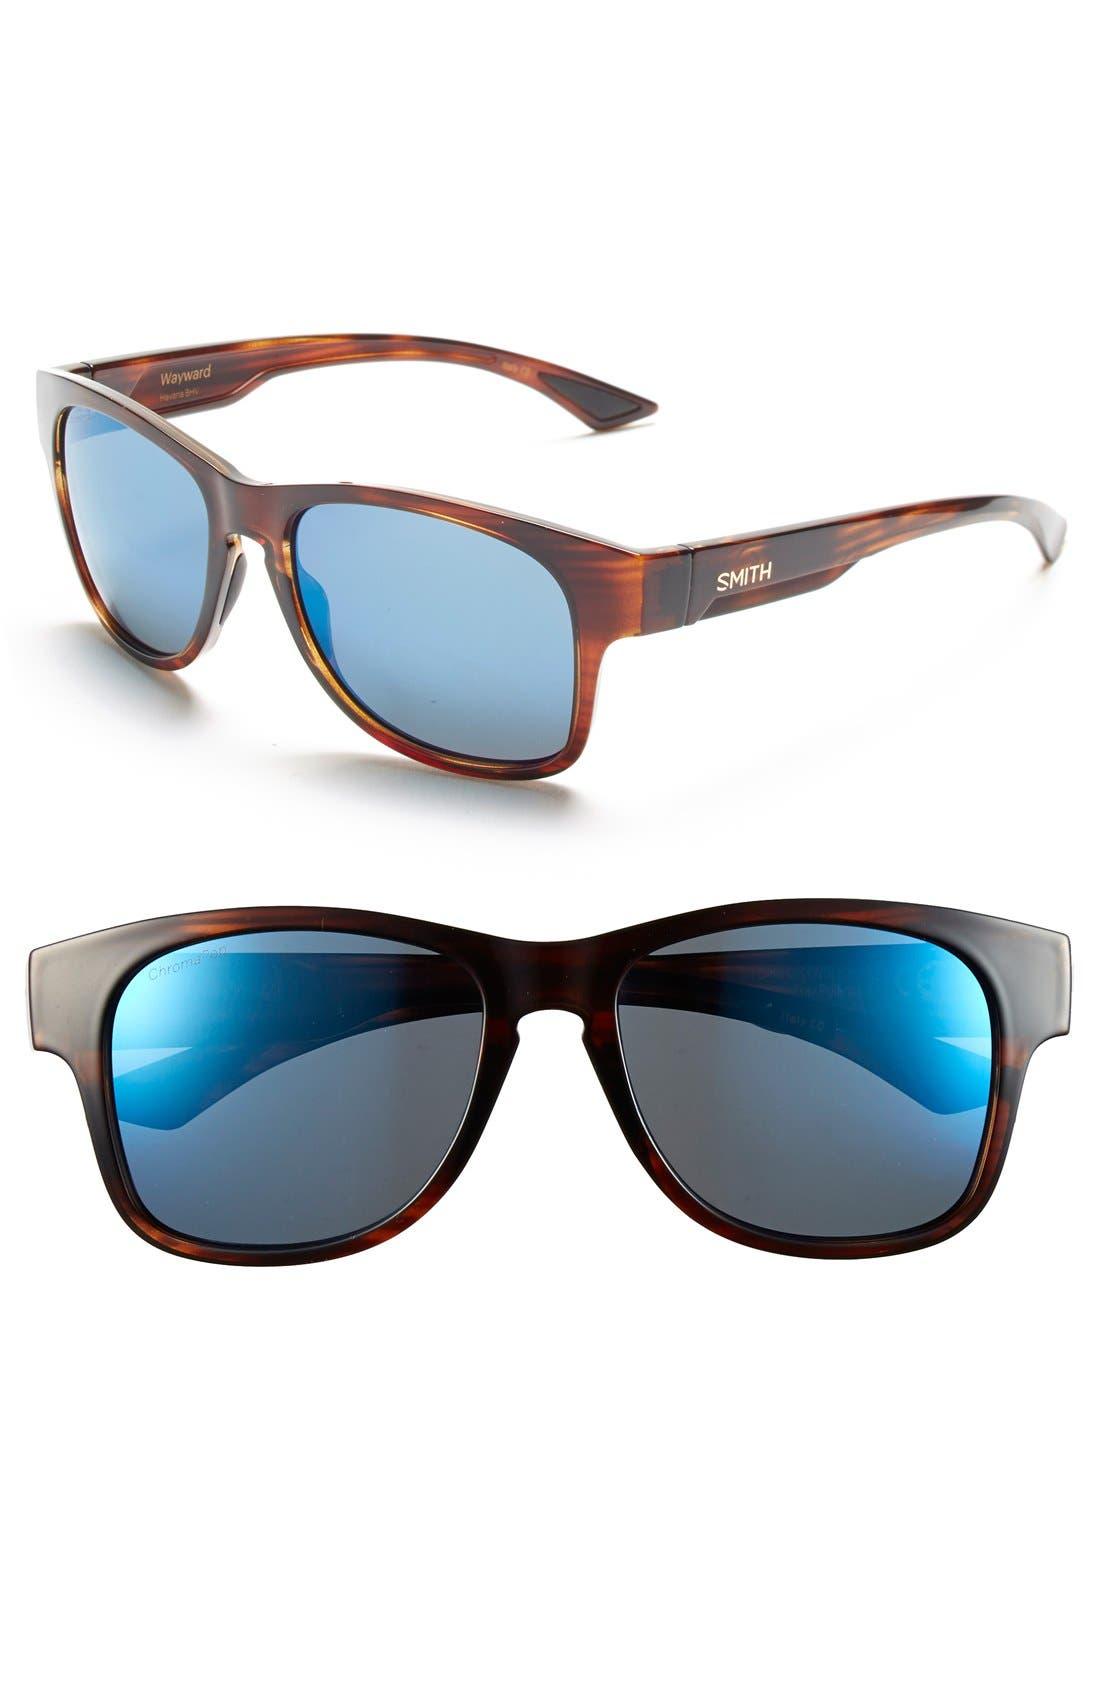 Main Image - Smith 'Wayward' 54mm Polarized Sunglasses